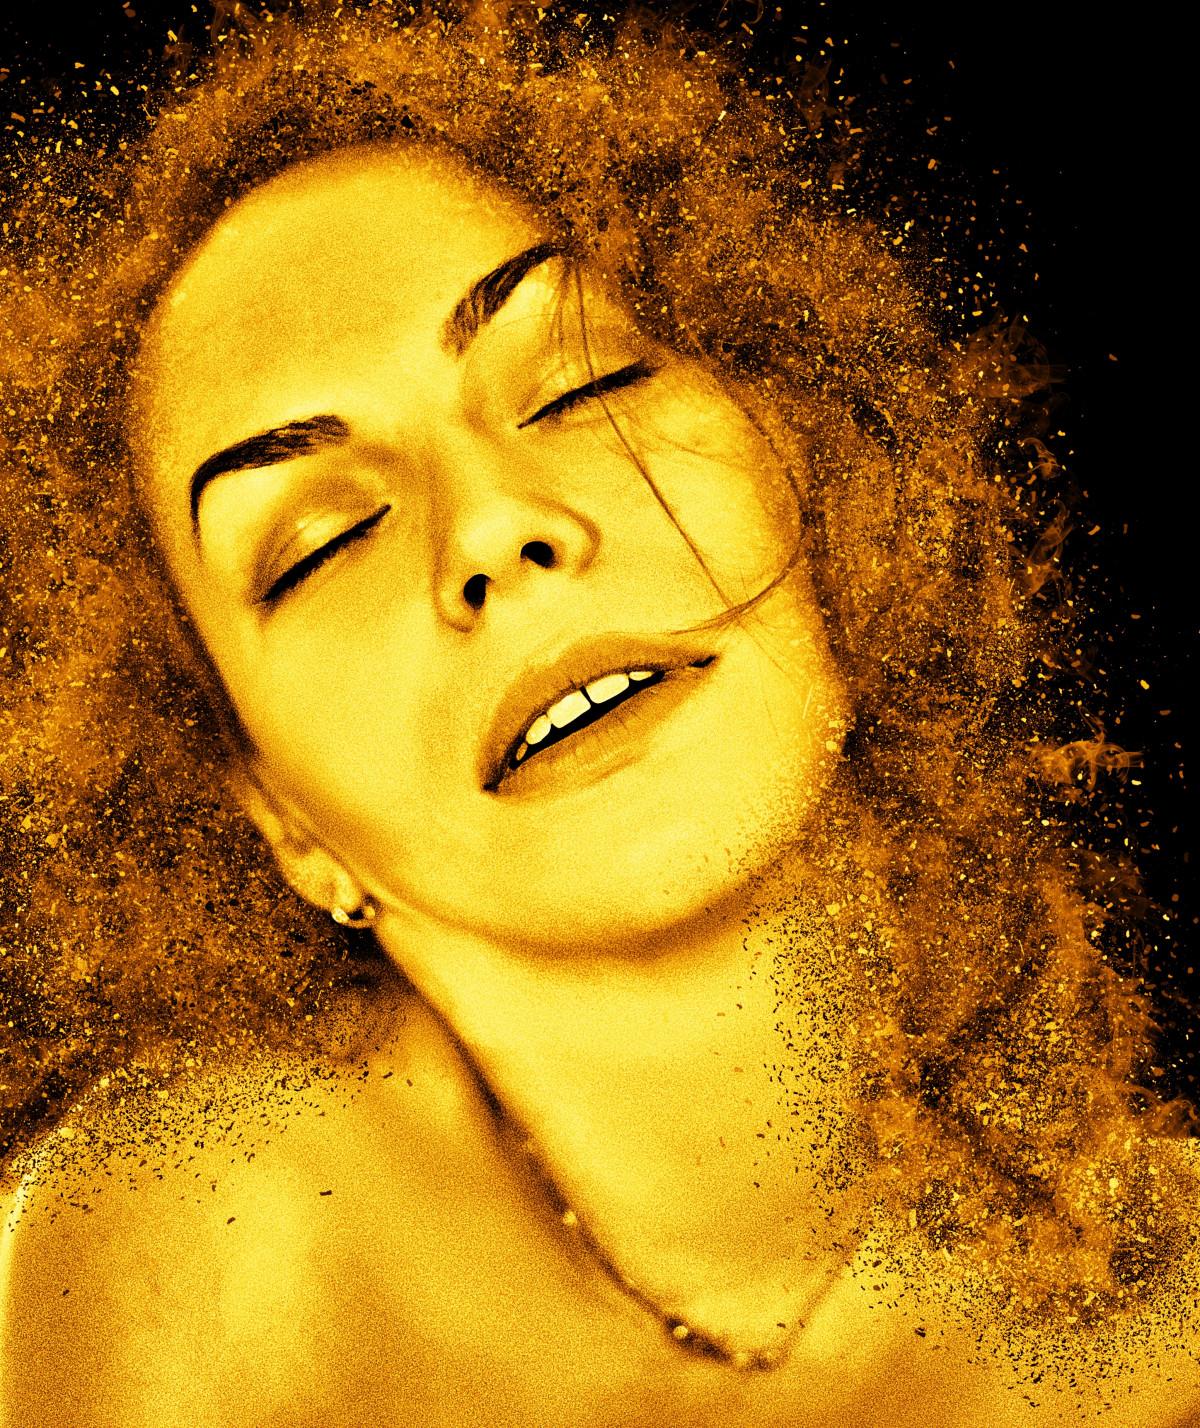 woman, hair, photography, female, portrait, yellow, close up, eyes closed, face, nose, art, eye, head, skin, beauty, beautiful, sexy, pretty, organ, seductive, emotion, ecstasy, erotic, sensual, album cover, smile model